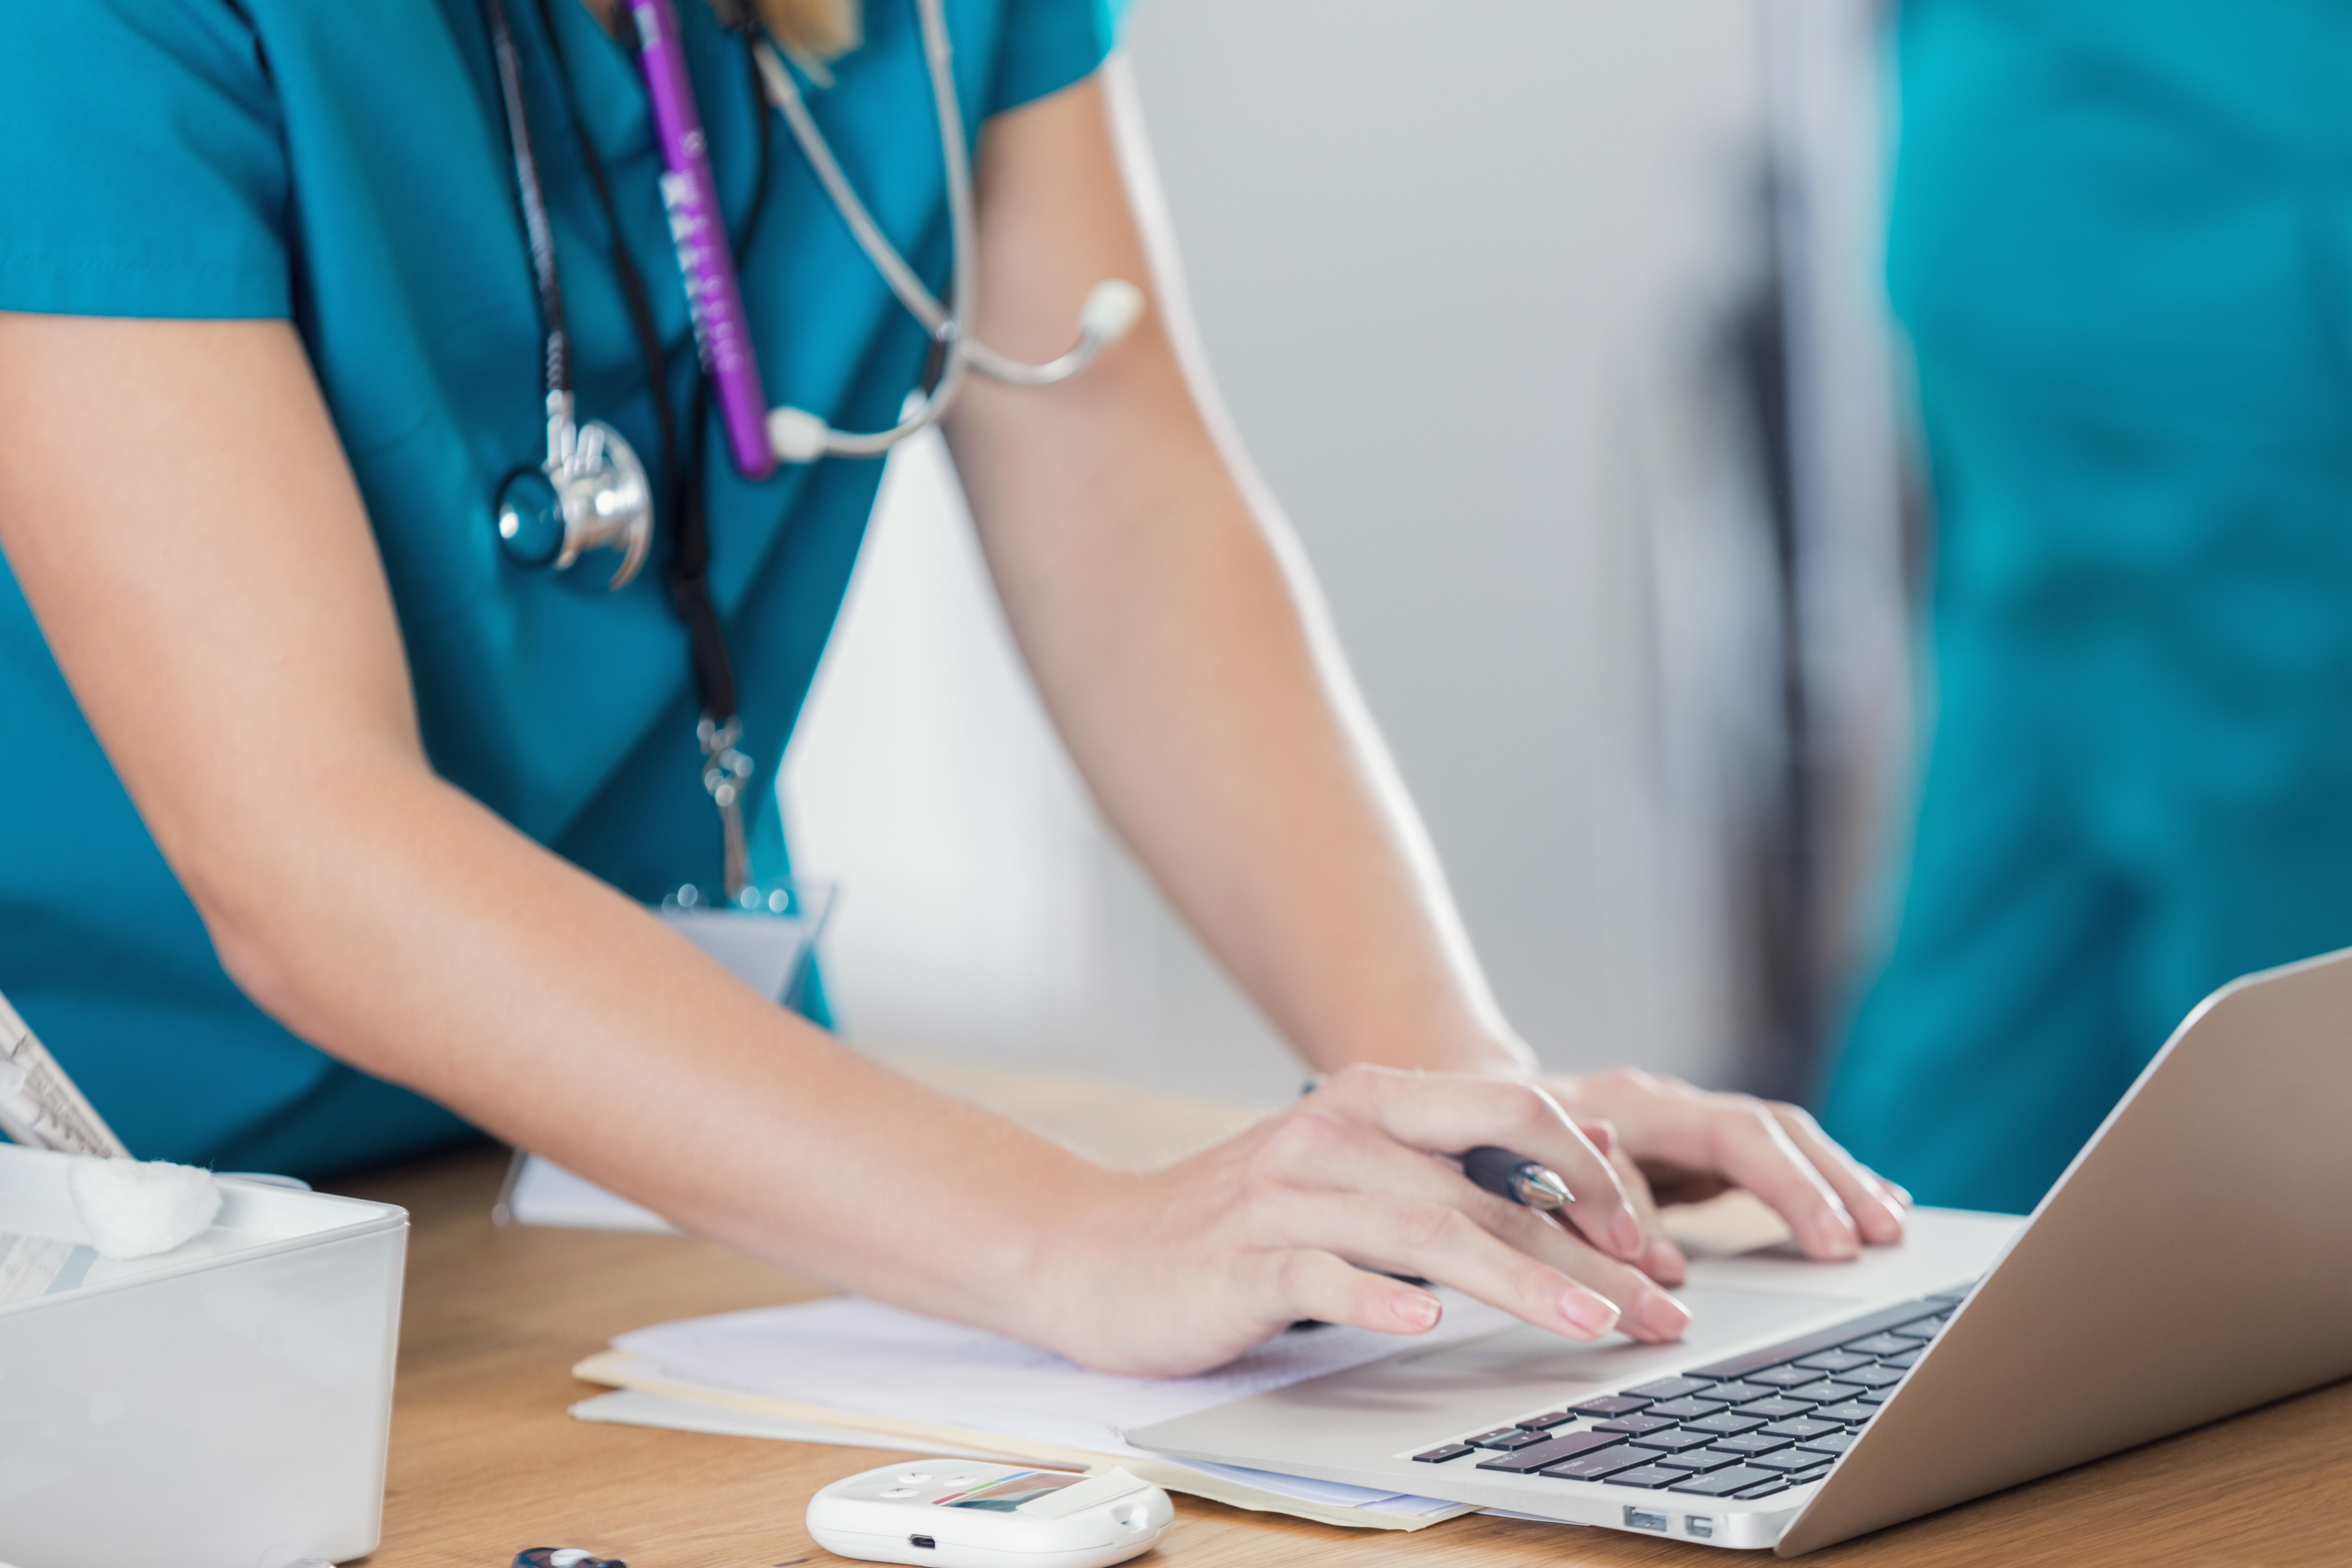 Closeup of a nurse working on a laptop